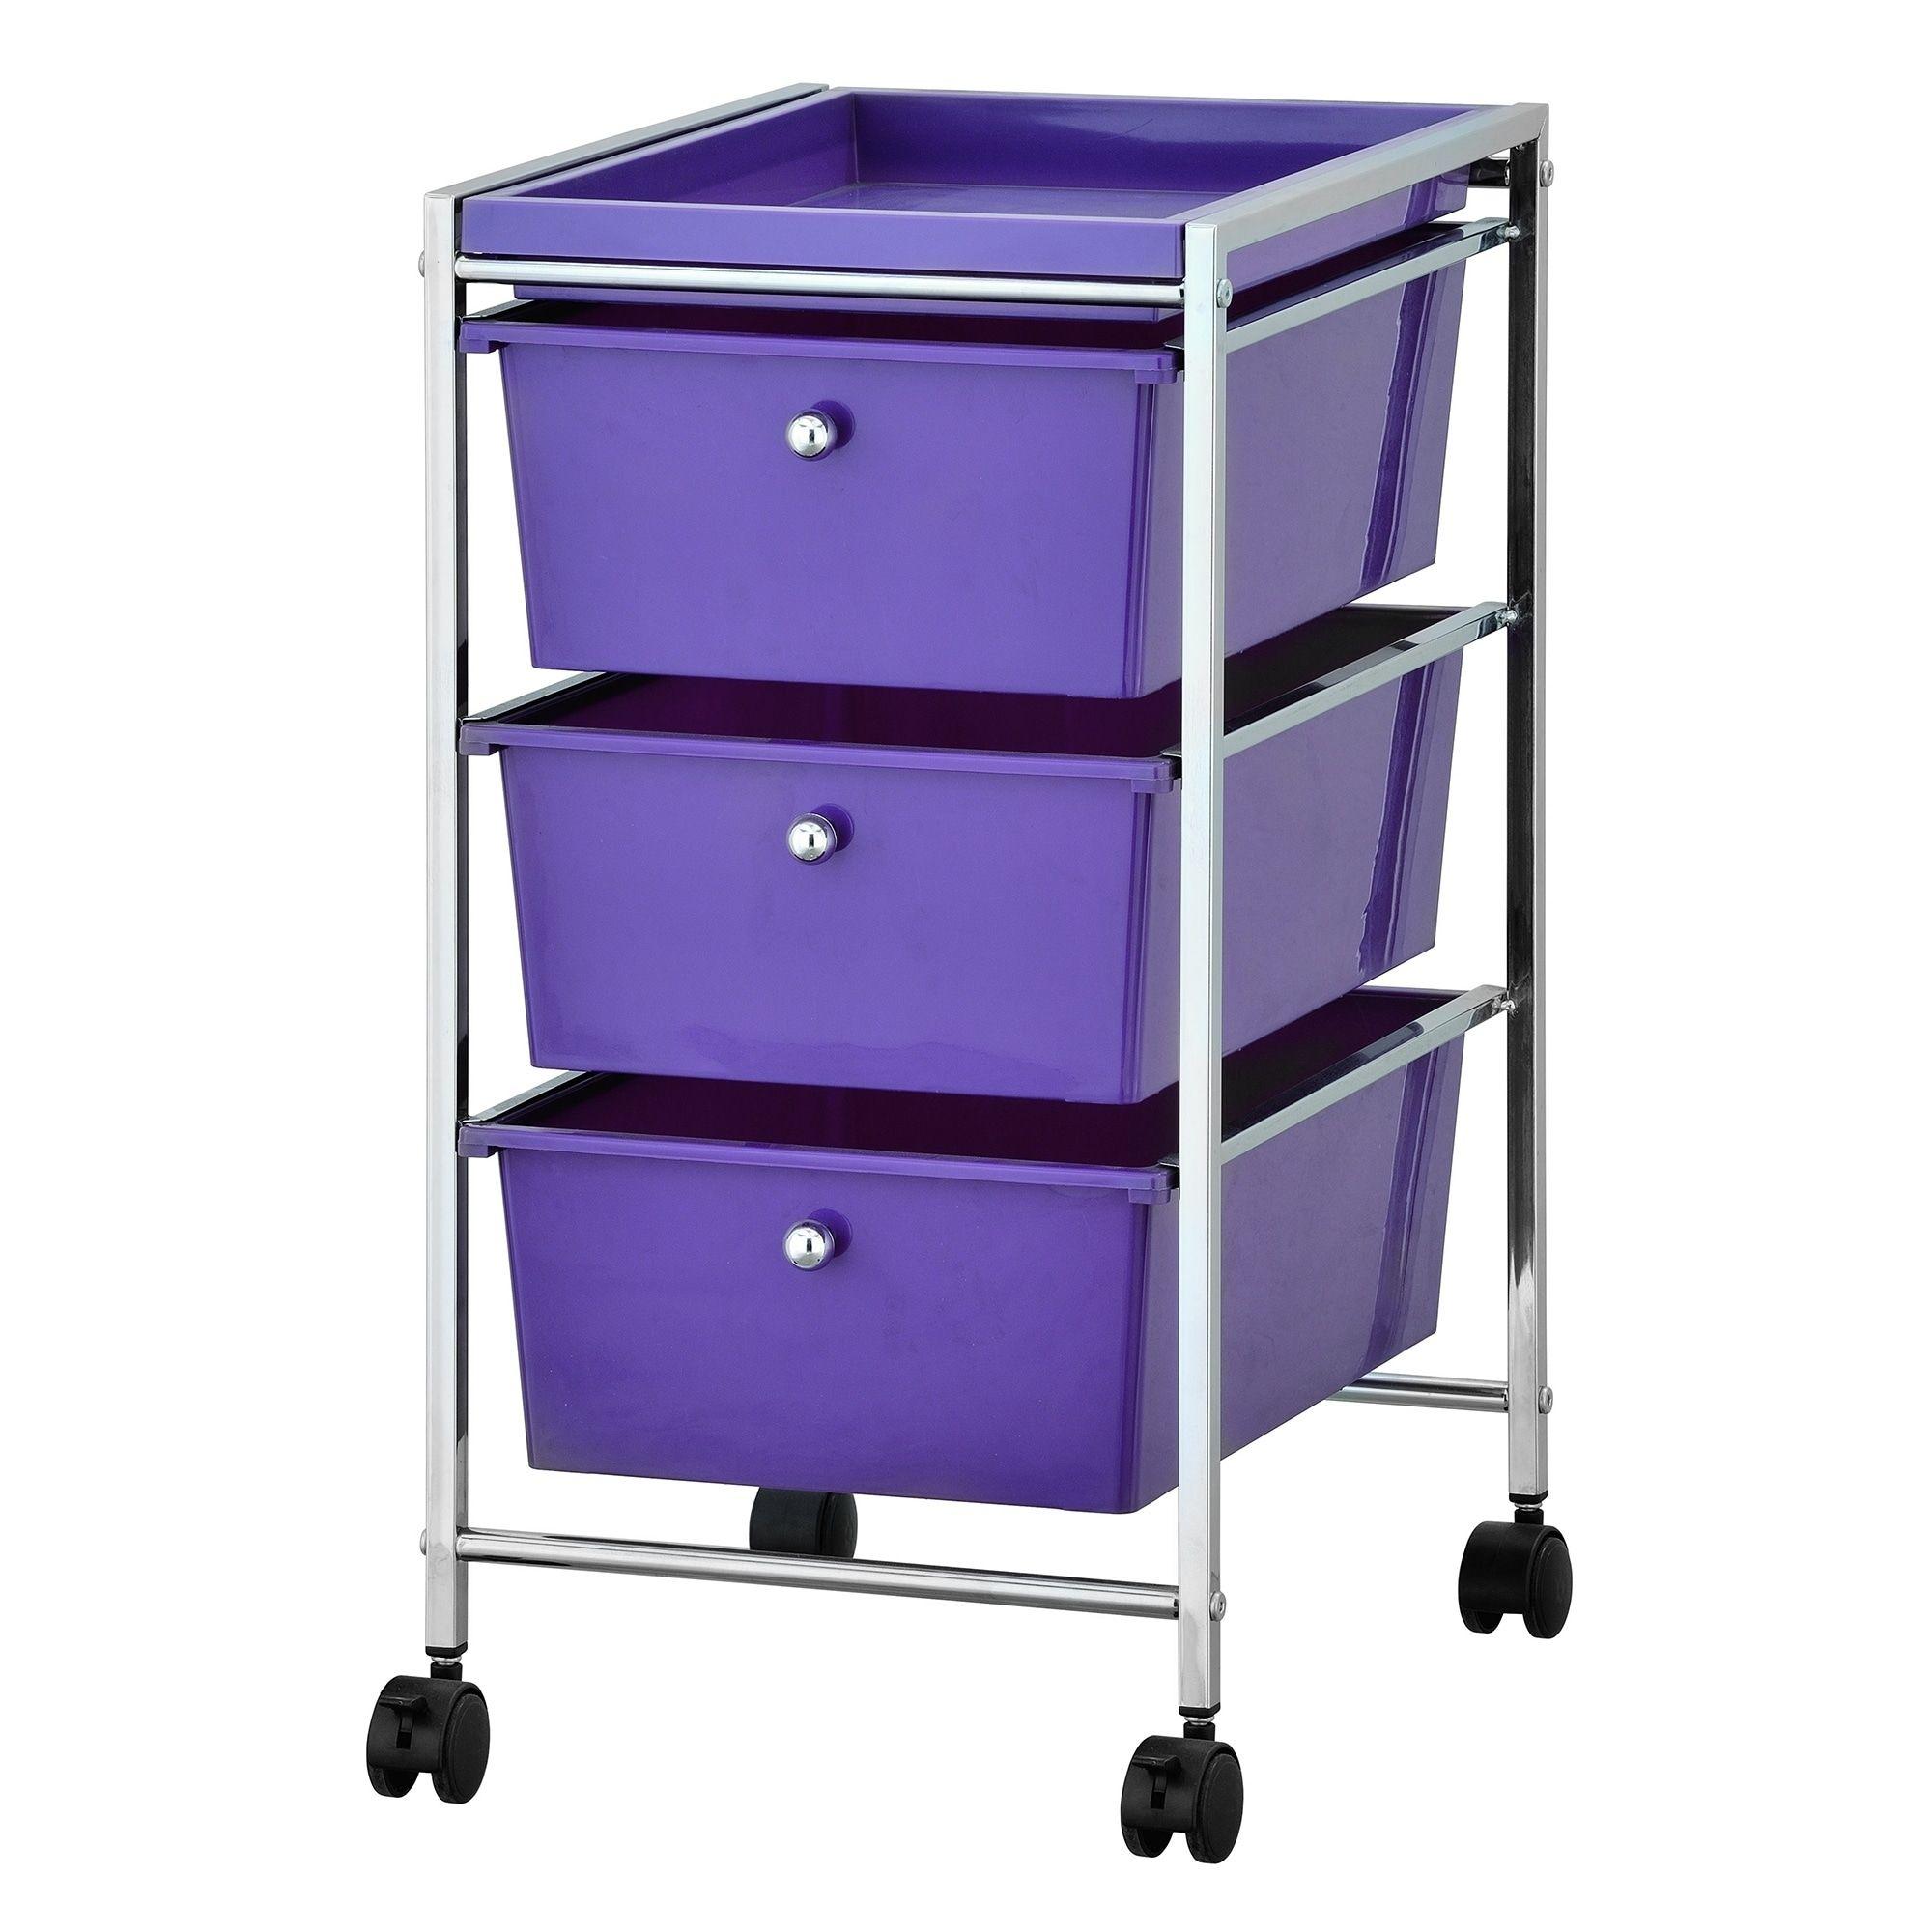 us ezserver storage drawers drawer plastic small units pinterest pin